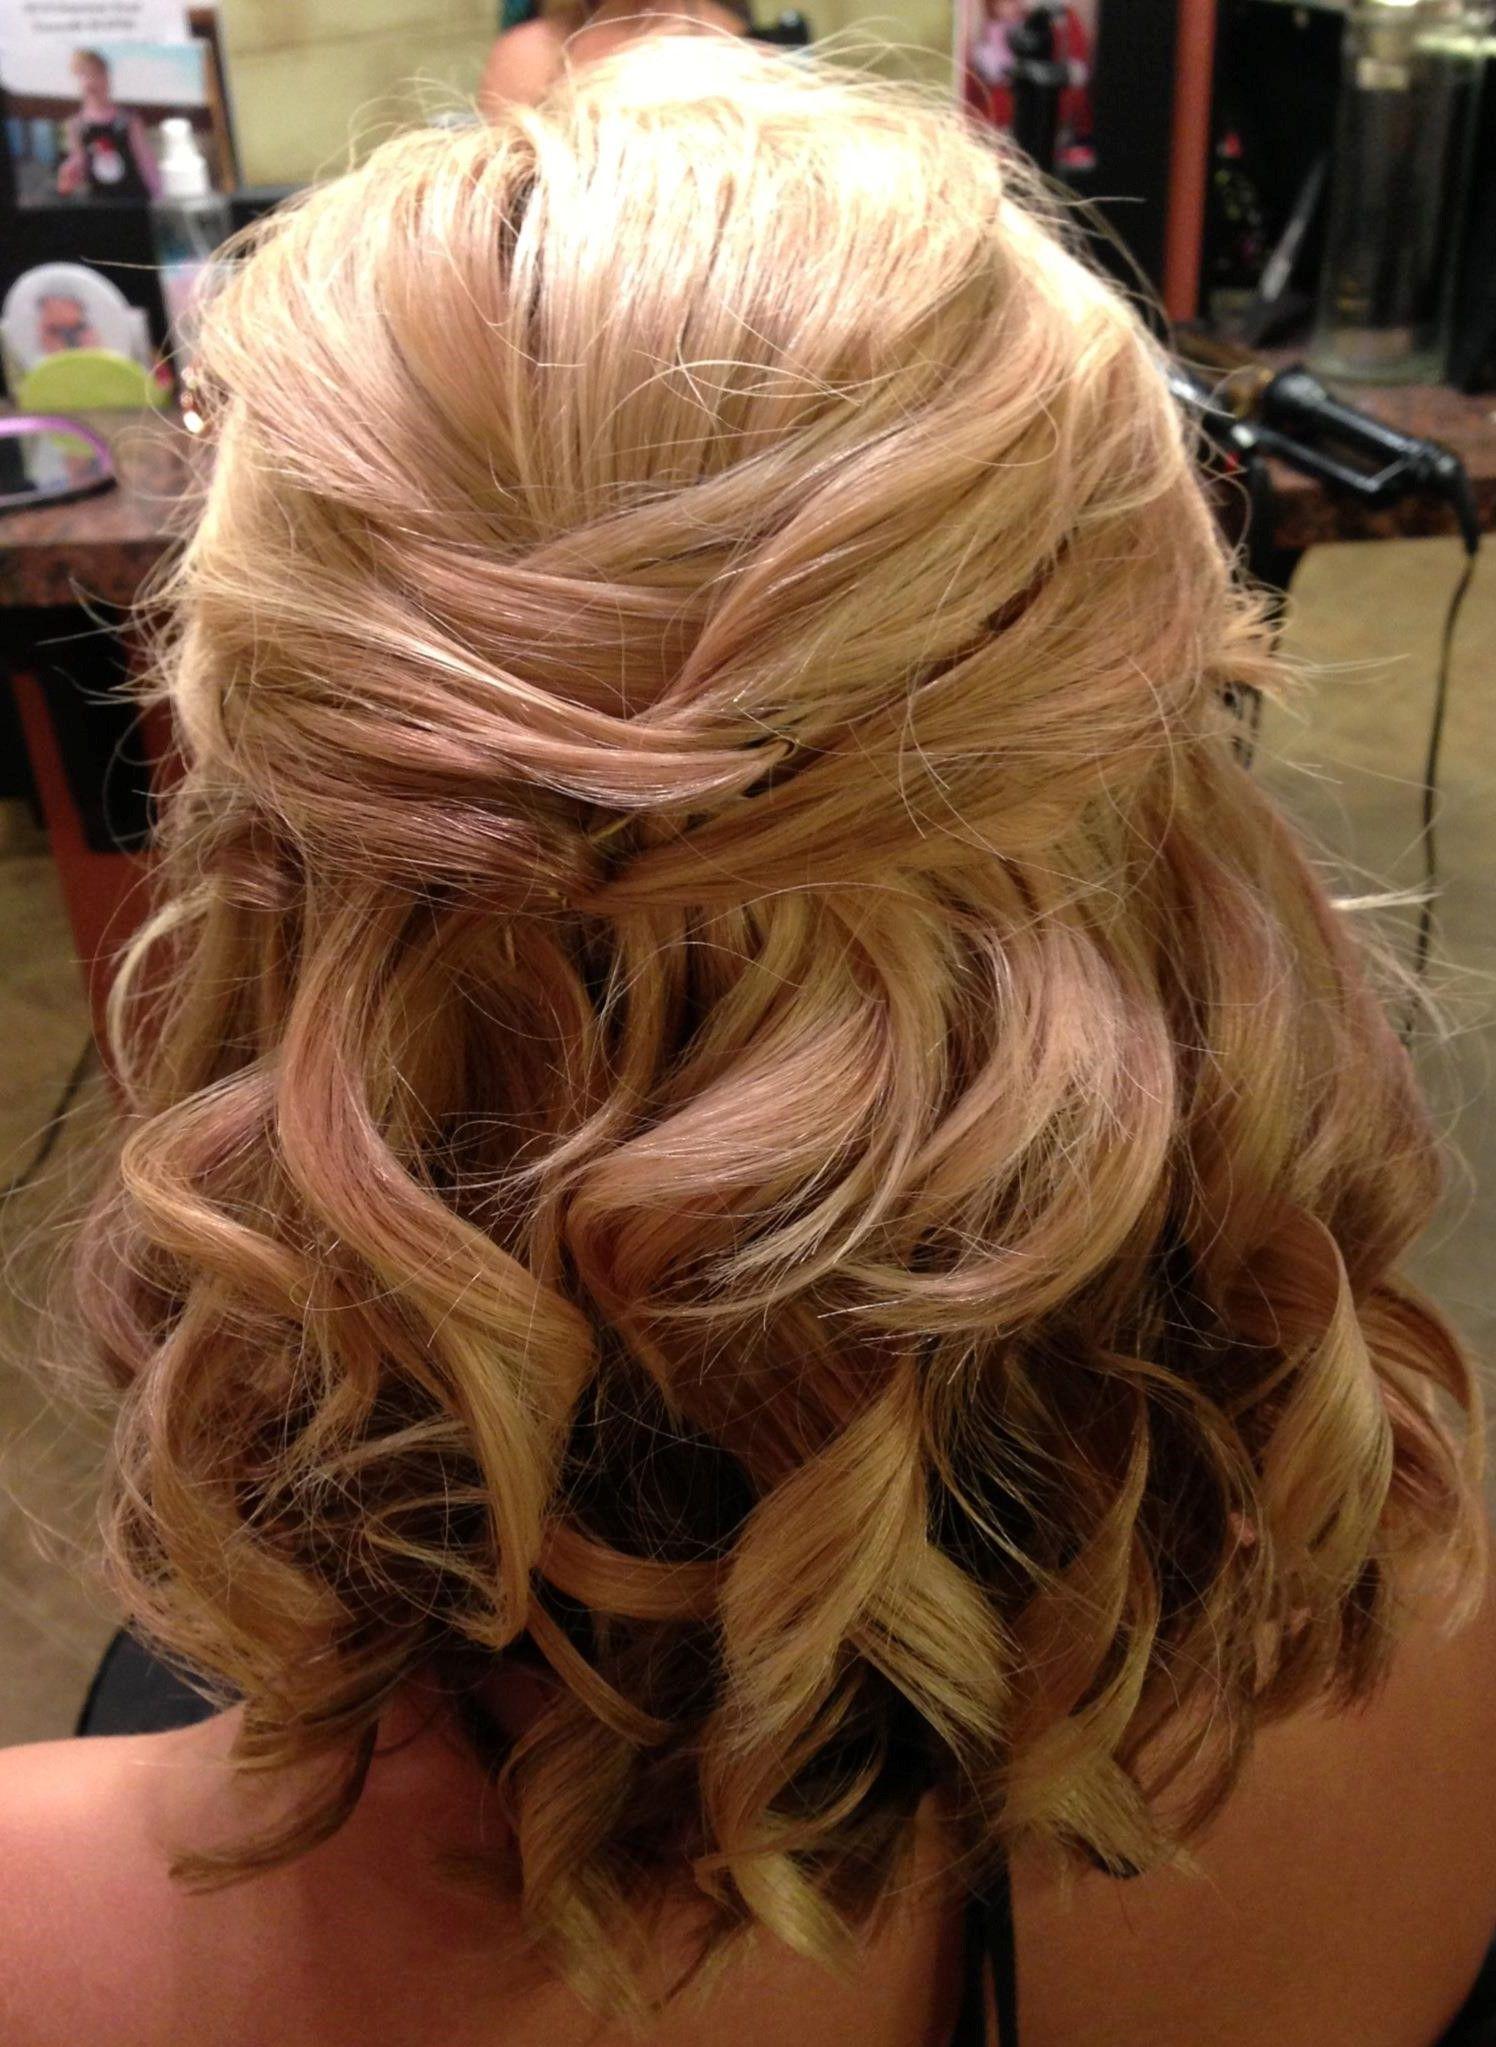 Half Up Down Hairstyles For Short Curly Hair Short Curly H Hairstyles For Me Wedding Hair Down Medium Length Hair Styles Wedding Hairstyles For Medium Hair